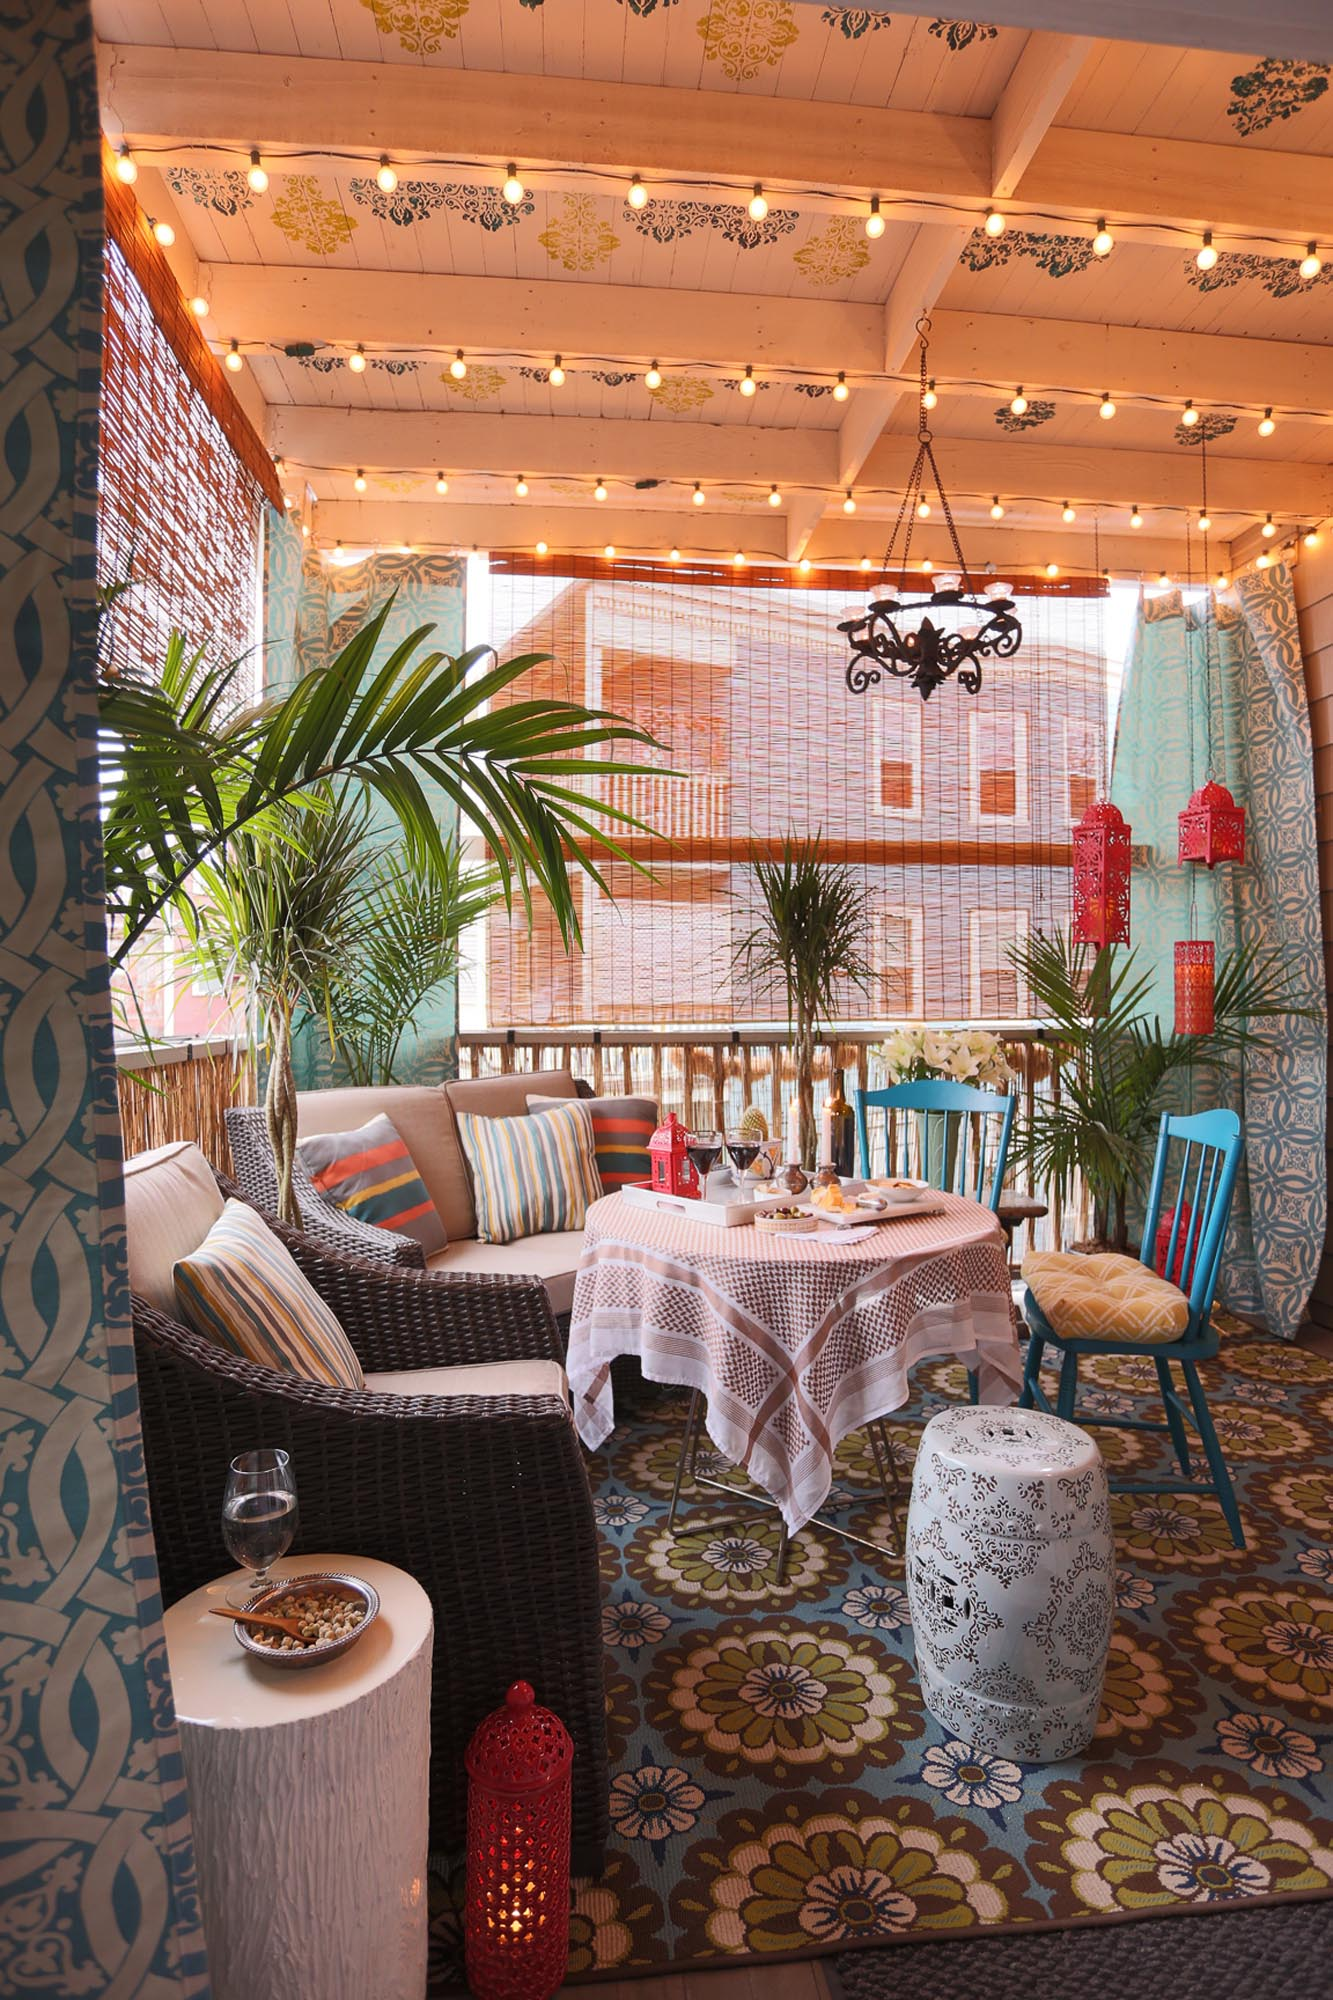 Boston Balcony with floral carpet floor design by Dane Austin Design